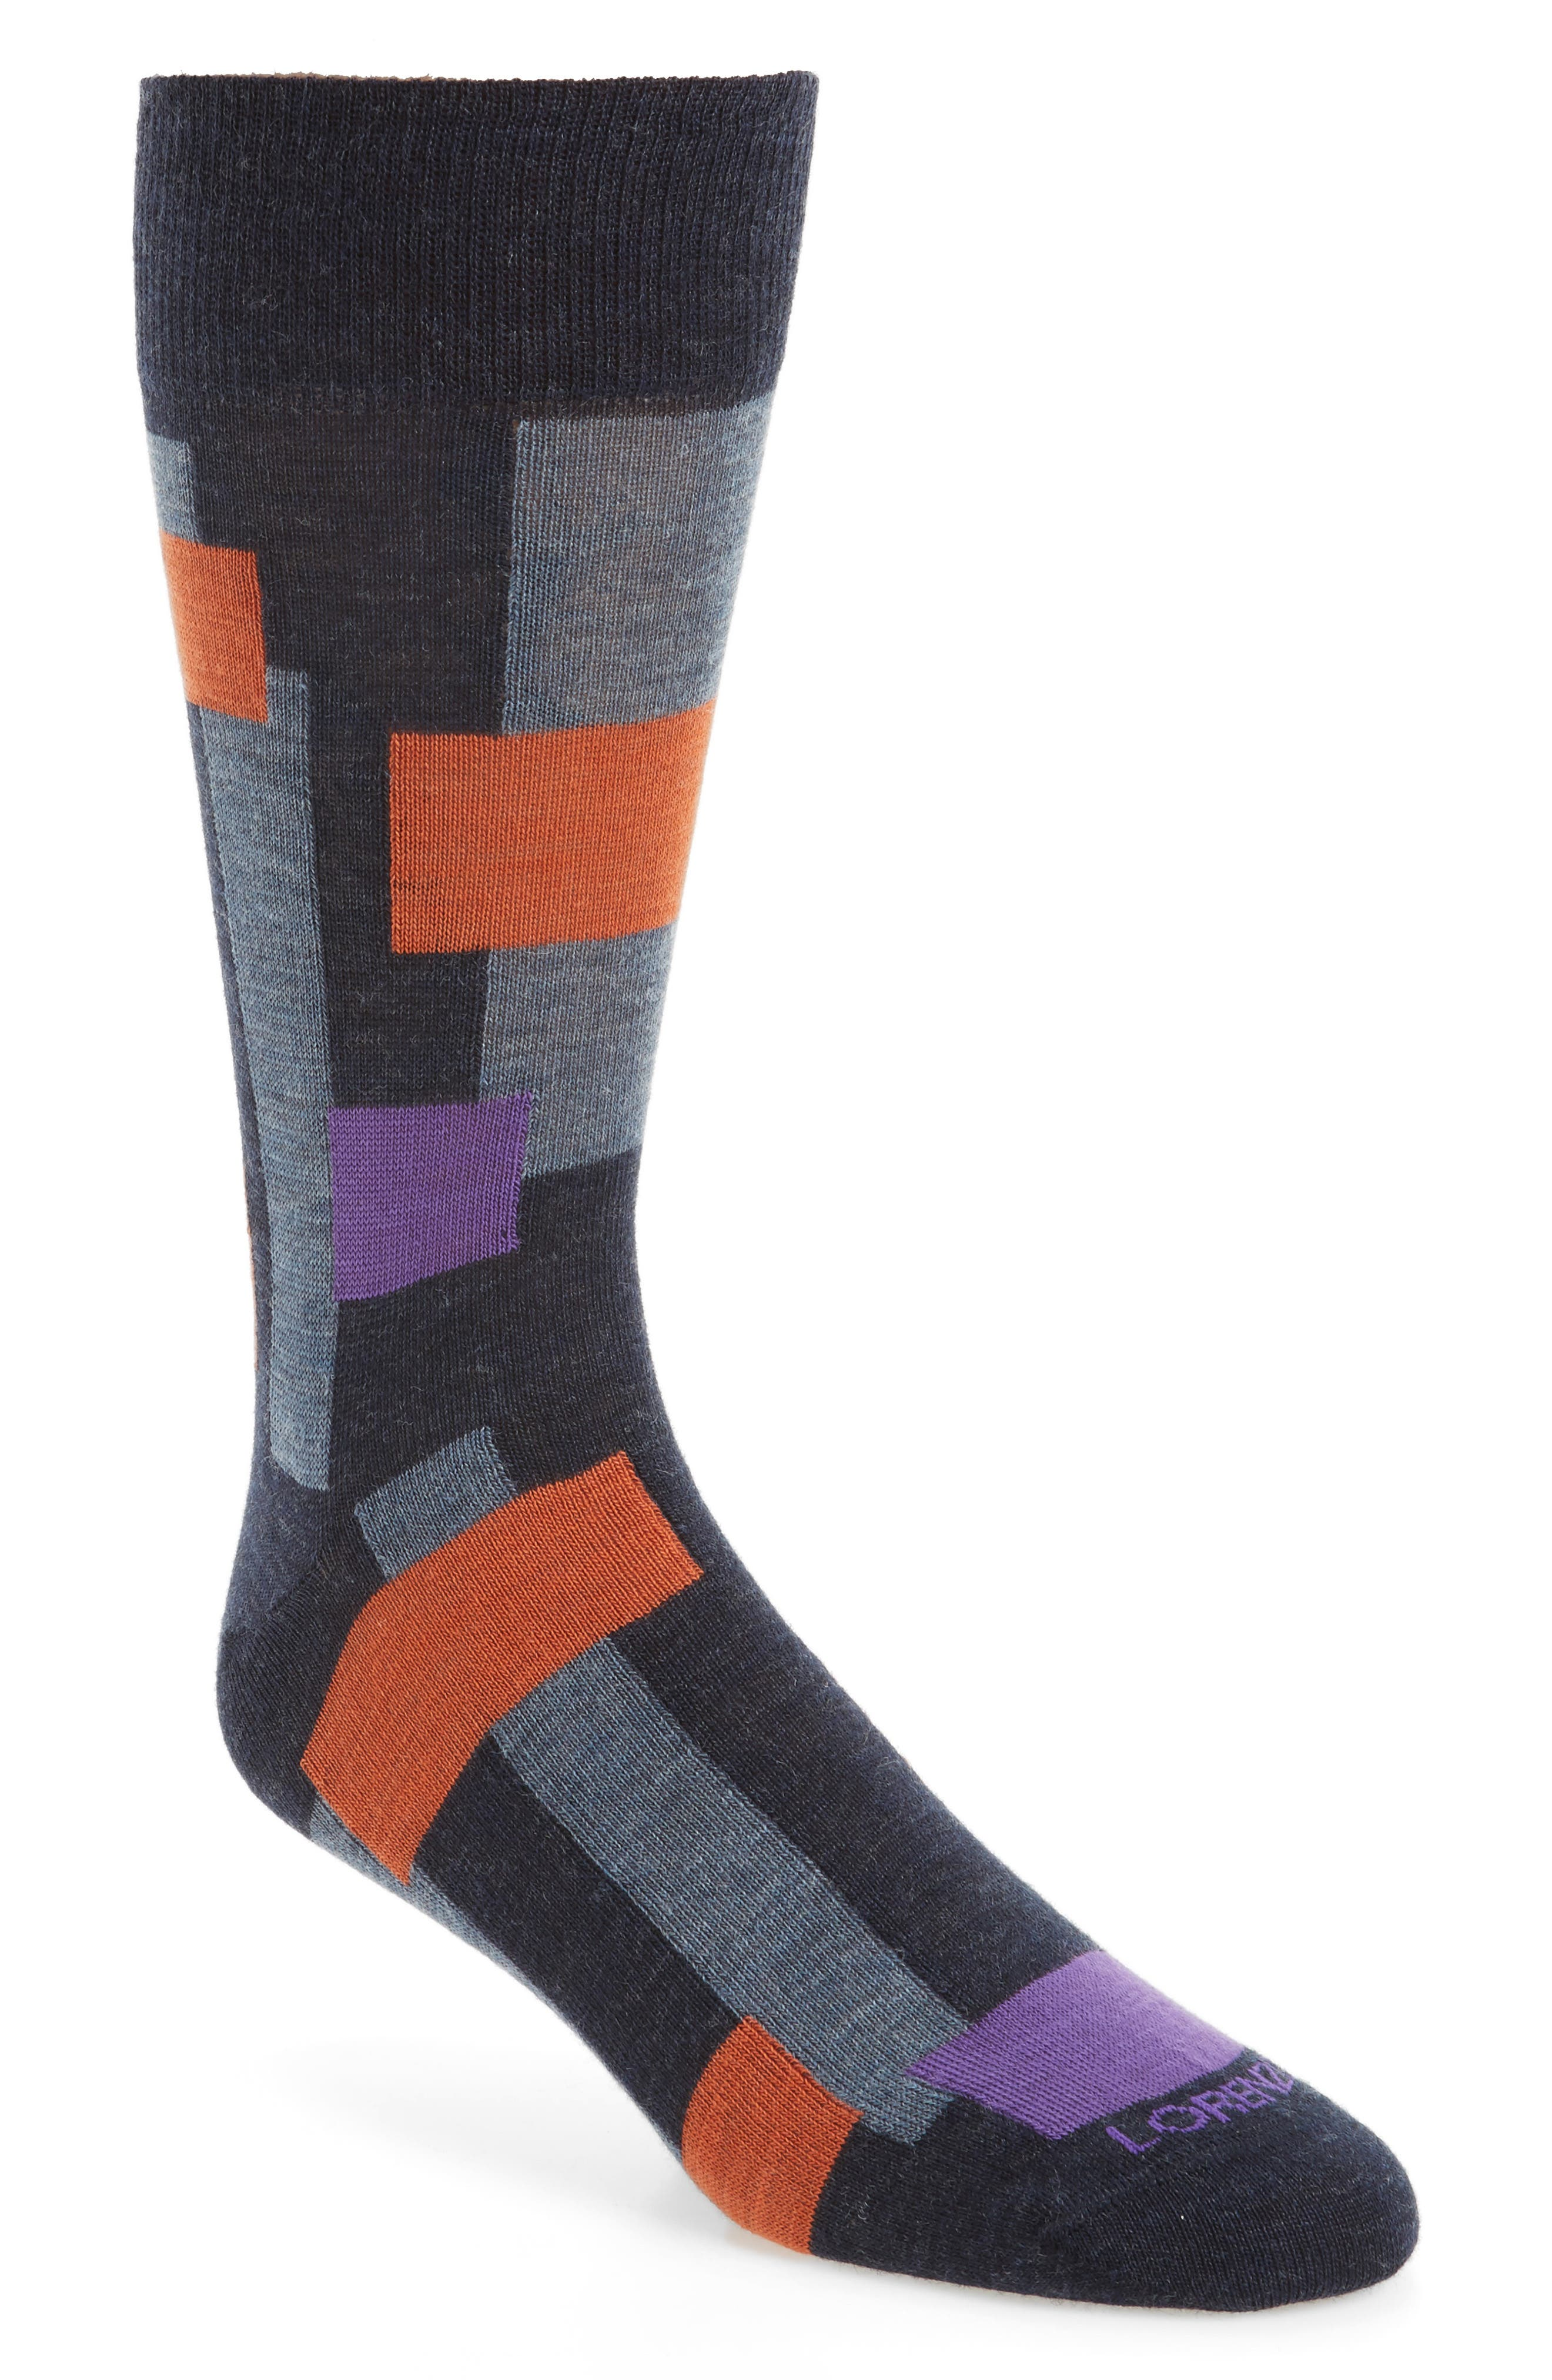 Lorenzo Uomo Socks